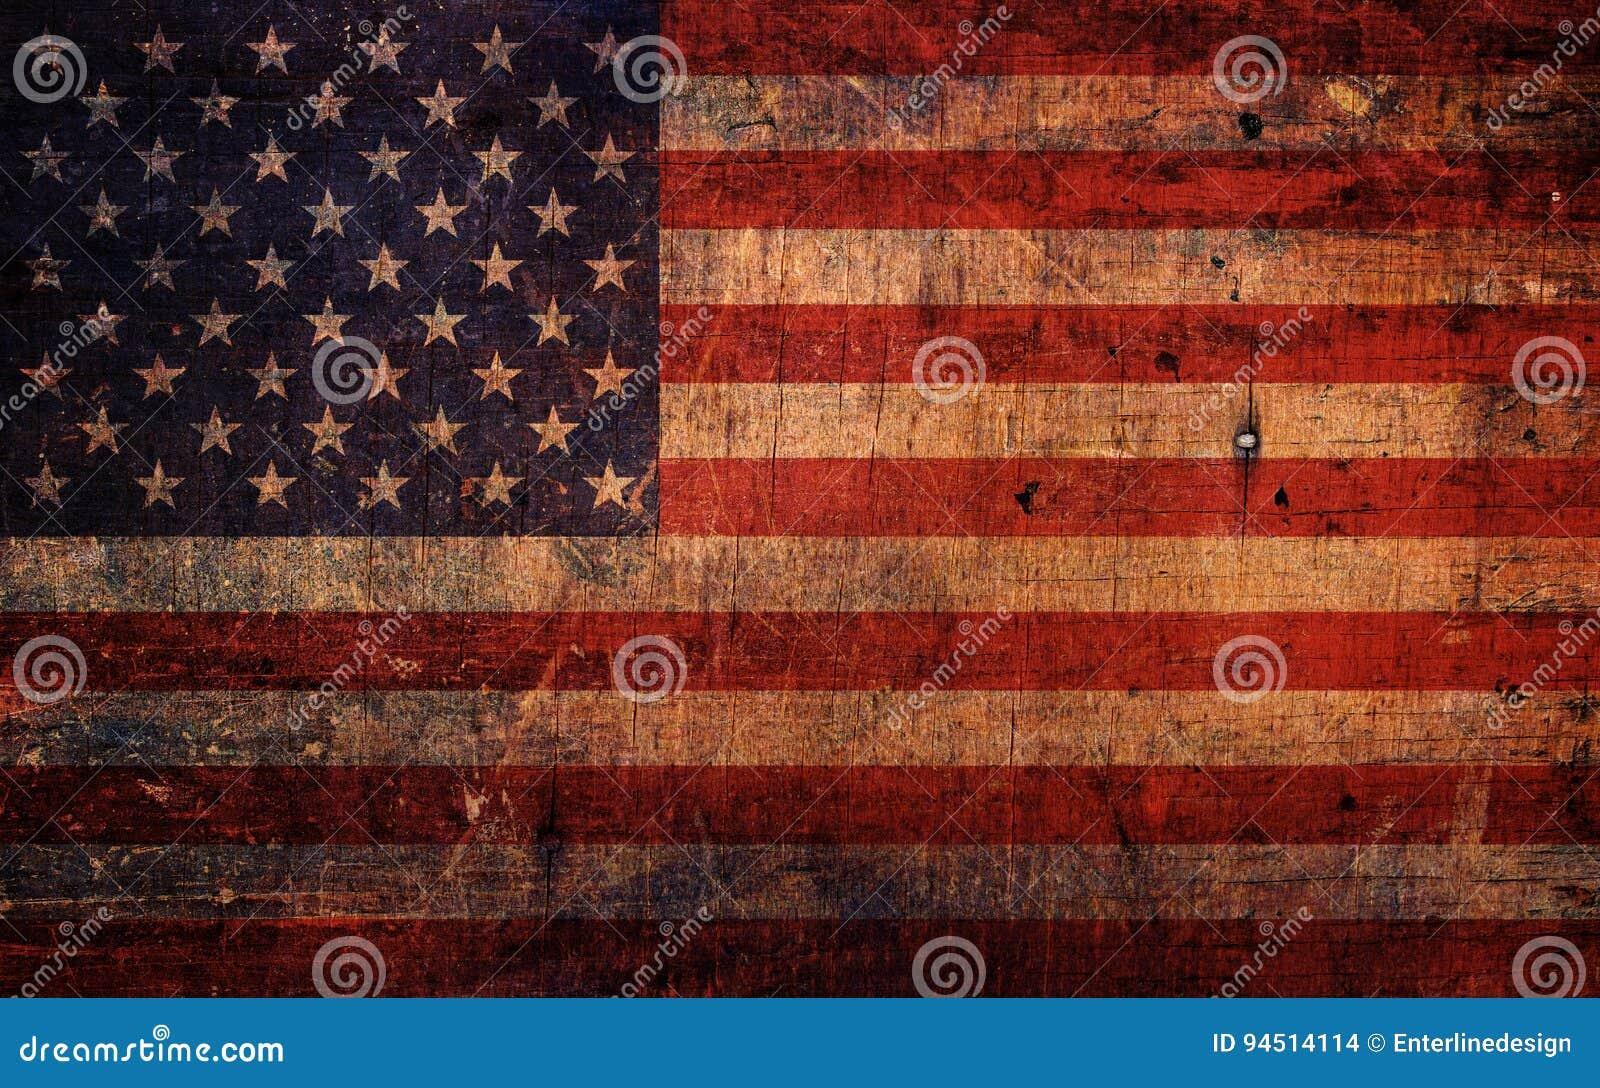 Rocznika Grunge Stara flaga amerykańska